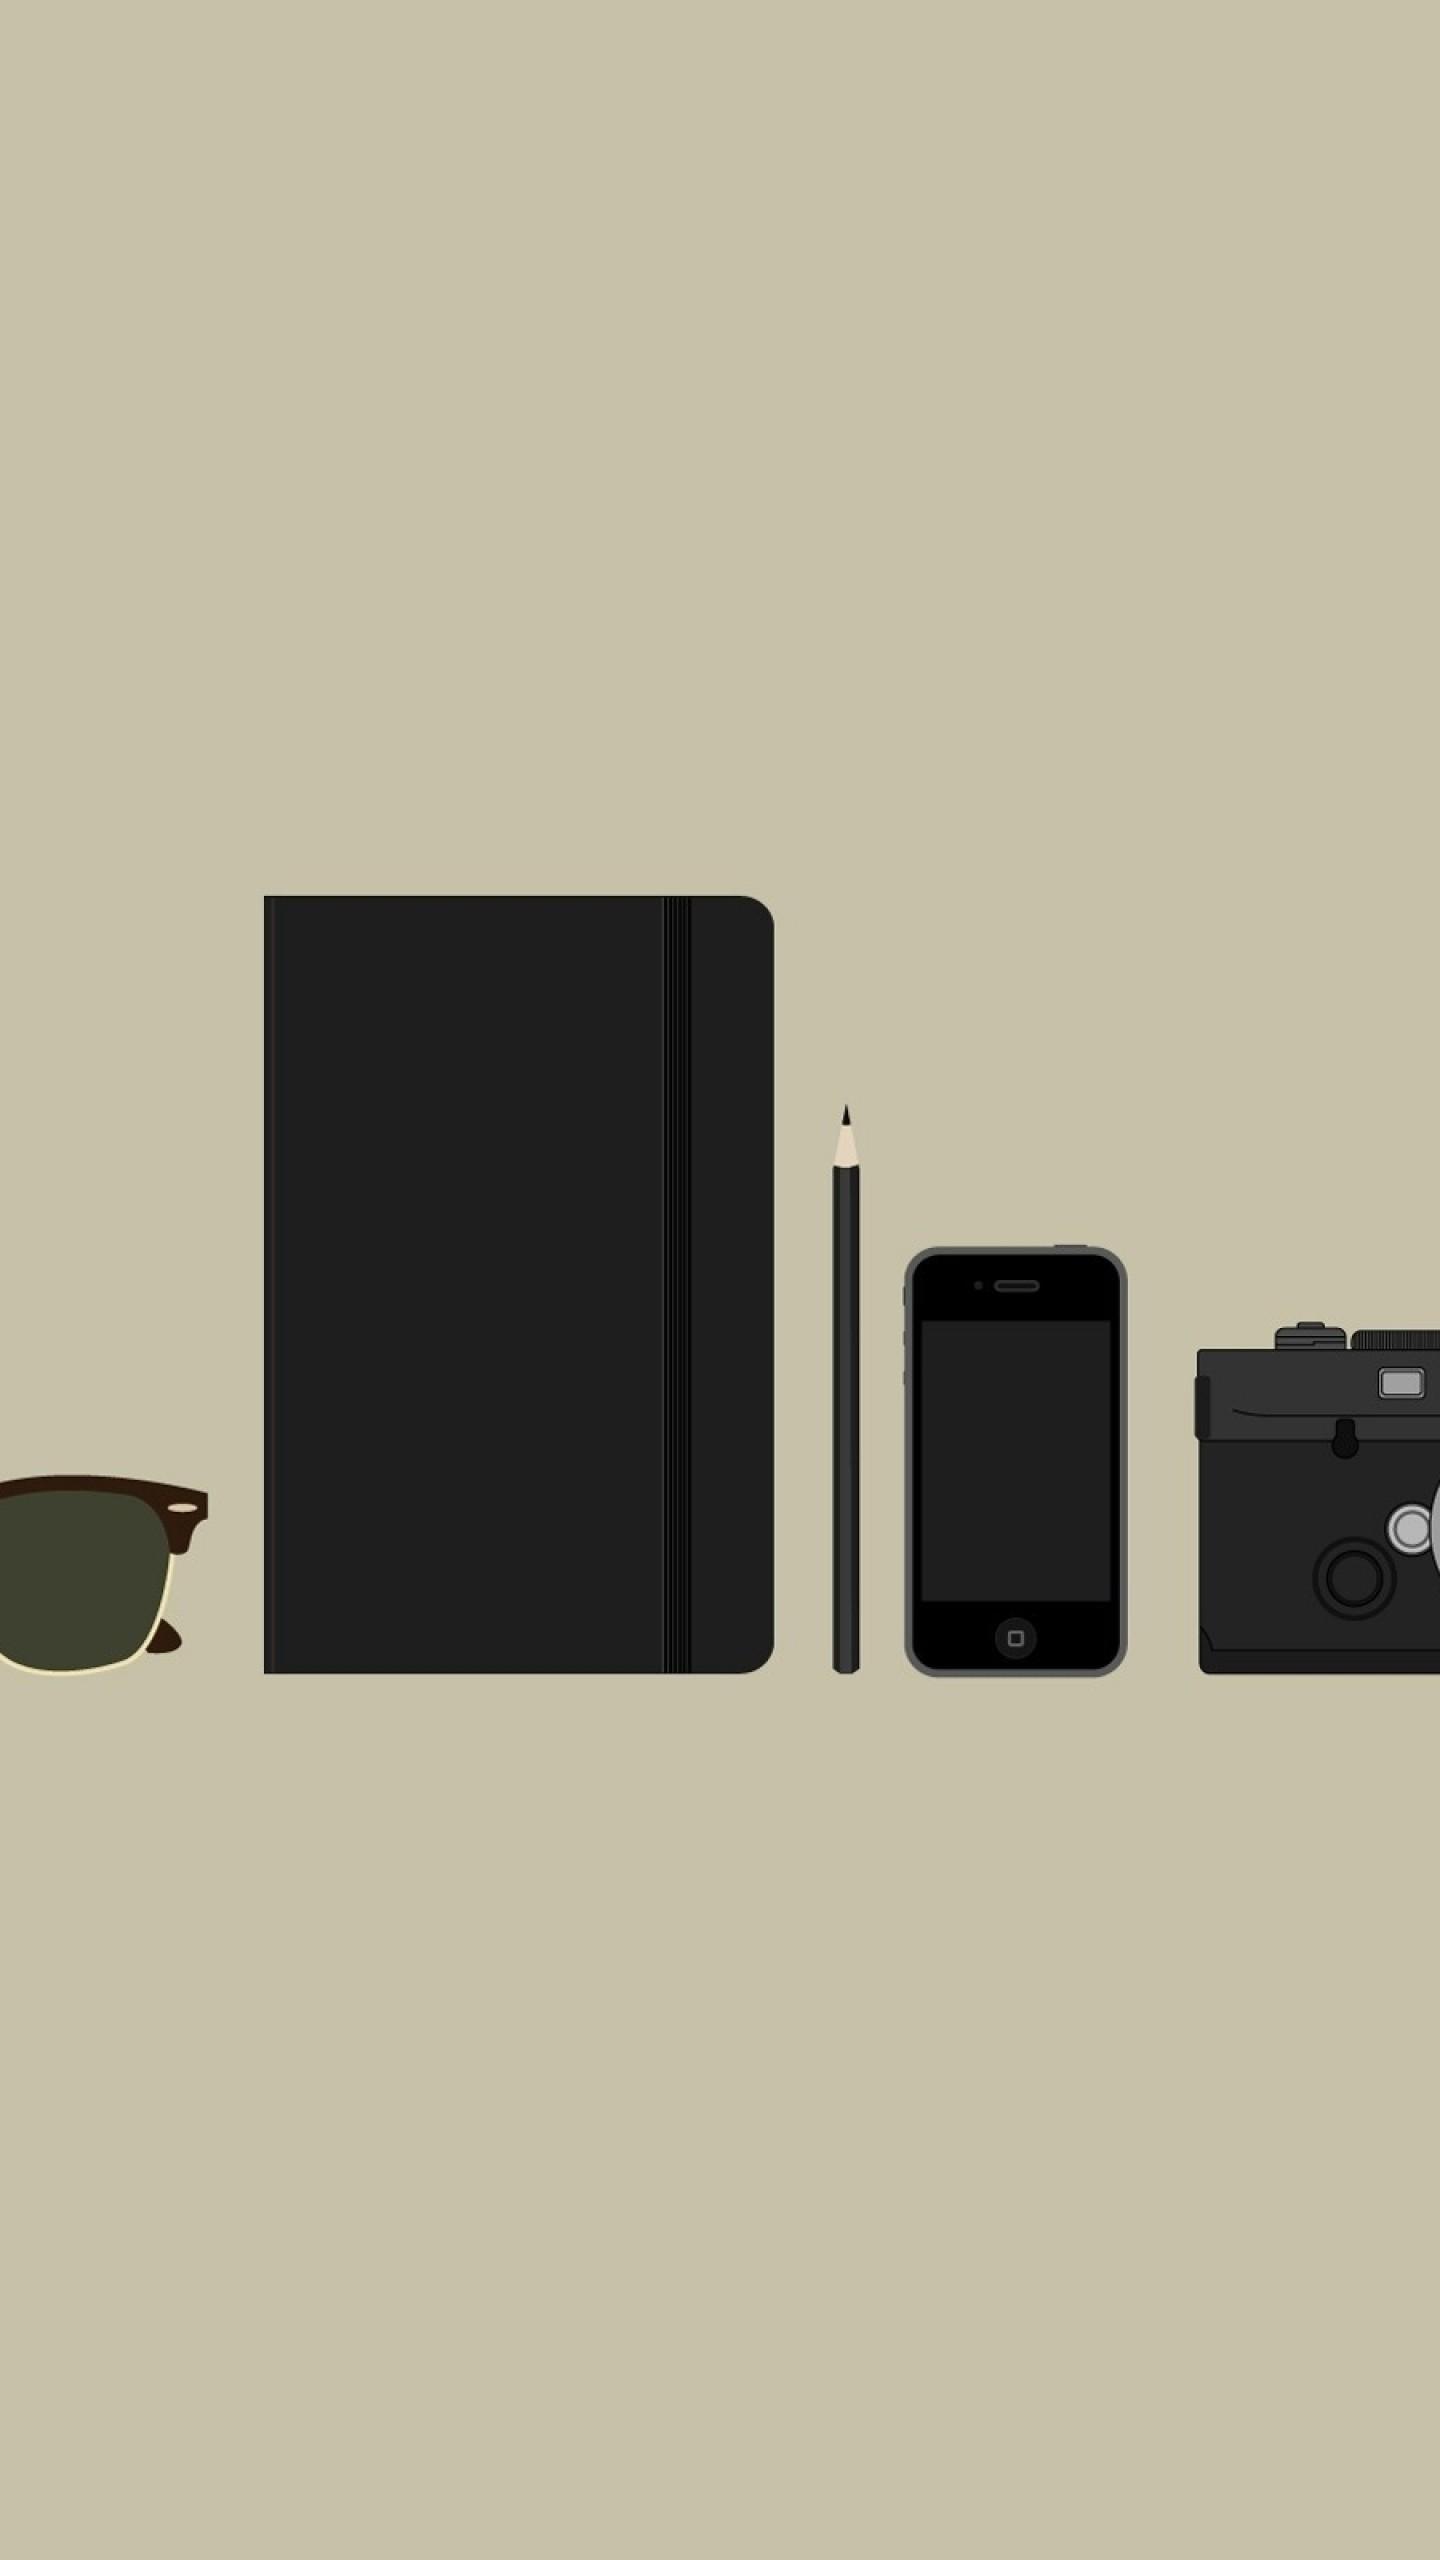 Wallpaper objects, camera, sunglasses, wallets, phones, minimalism